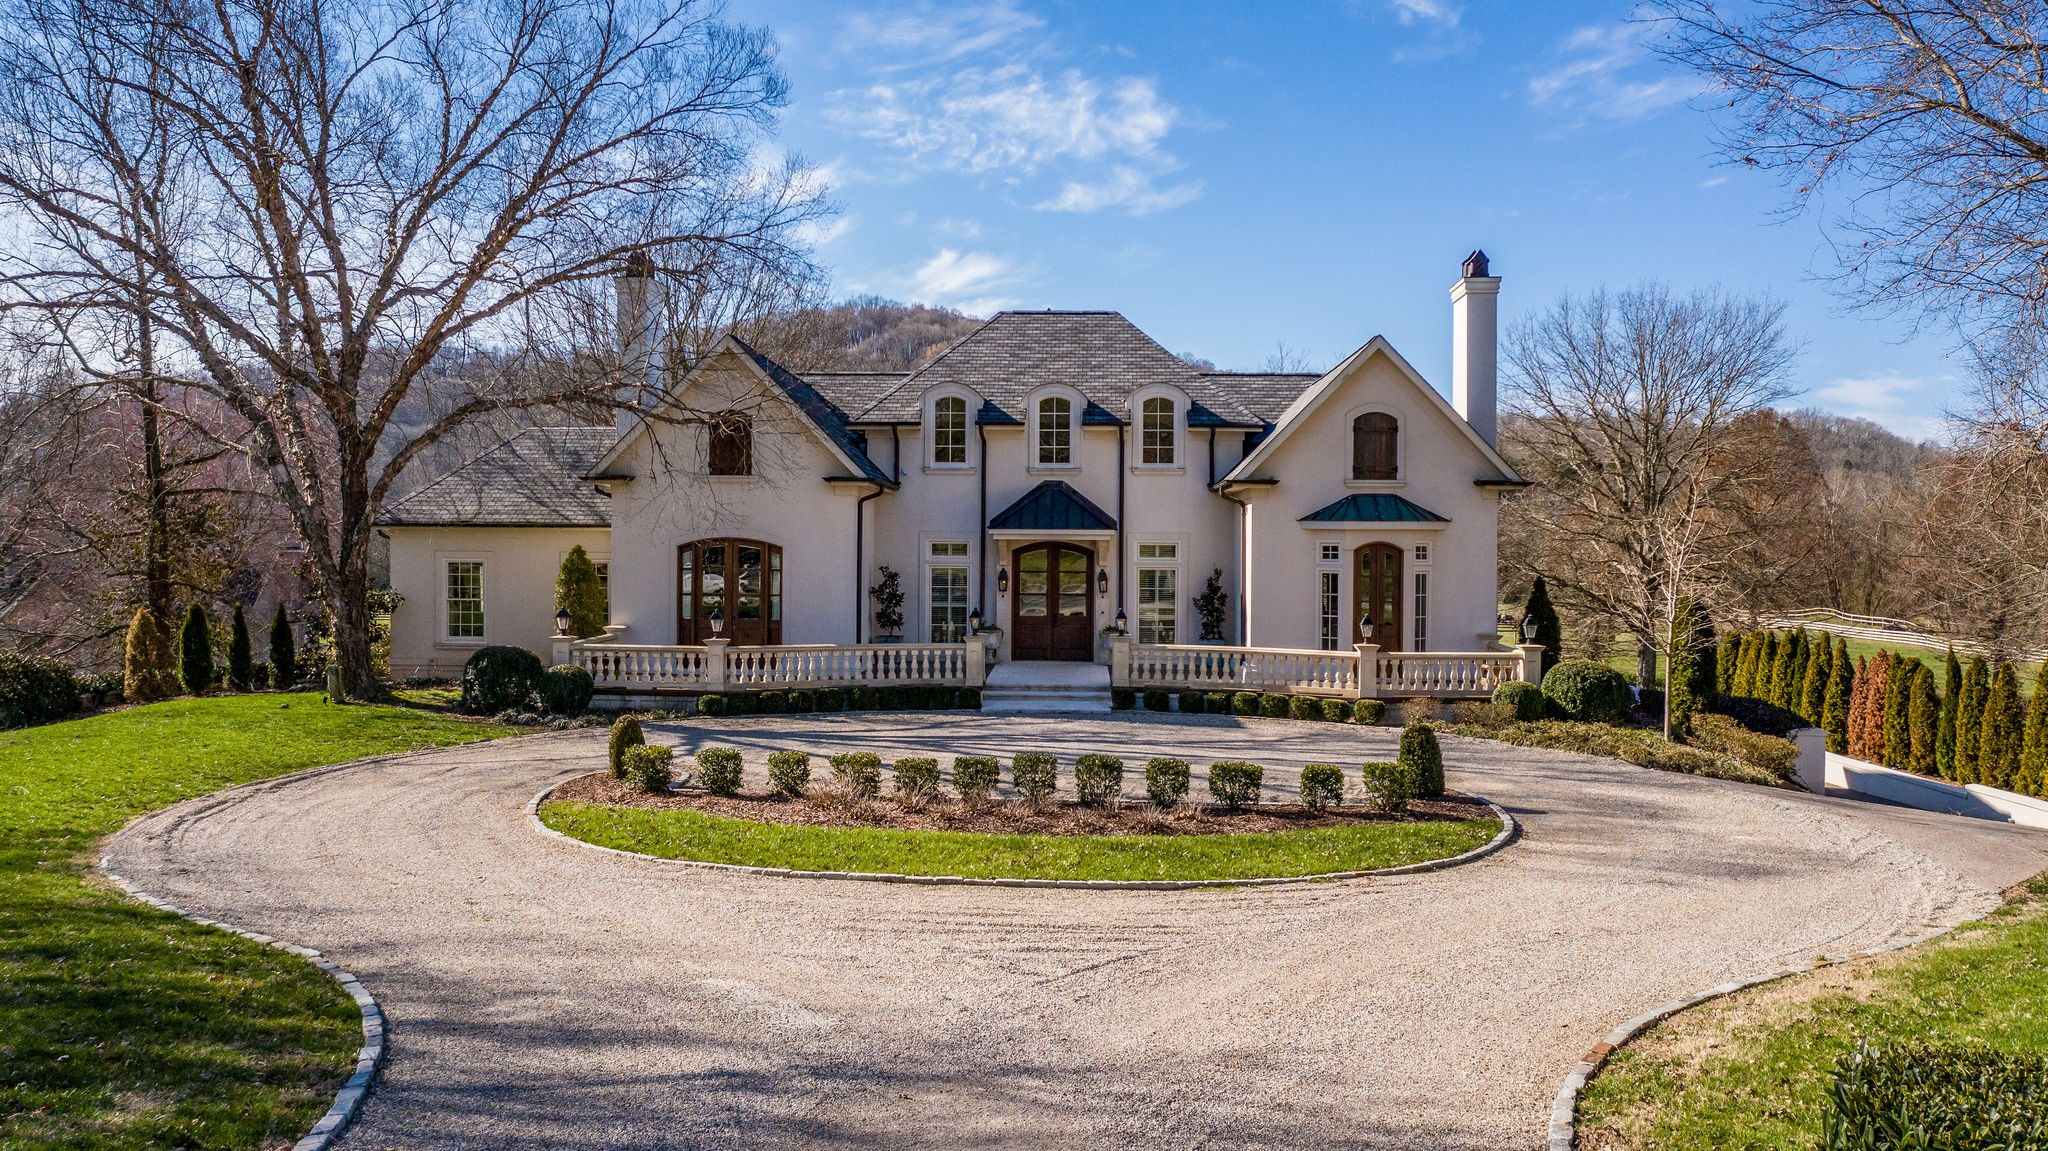 6440 Edinburgh Dr, Nashville, TN 37221 - Nashville, TN real estate listing